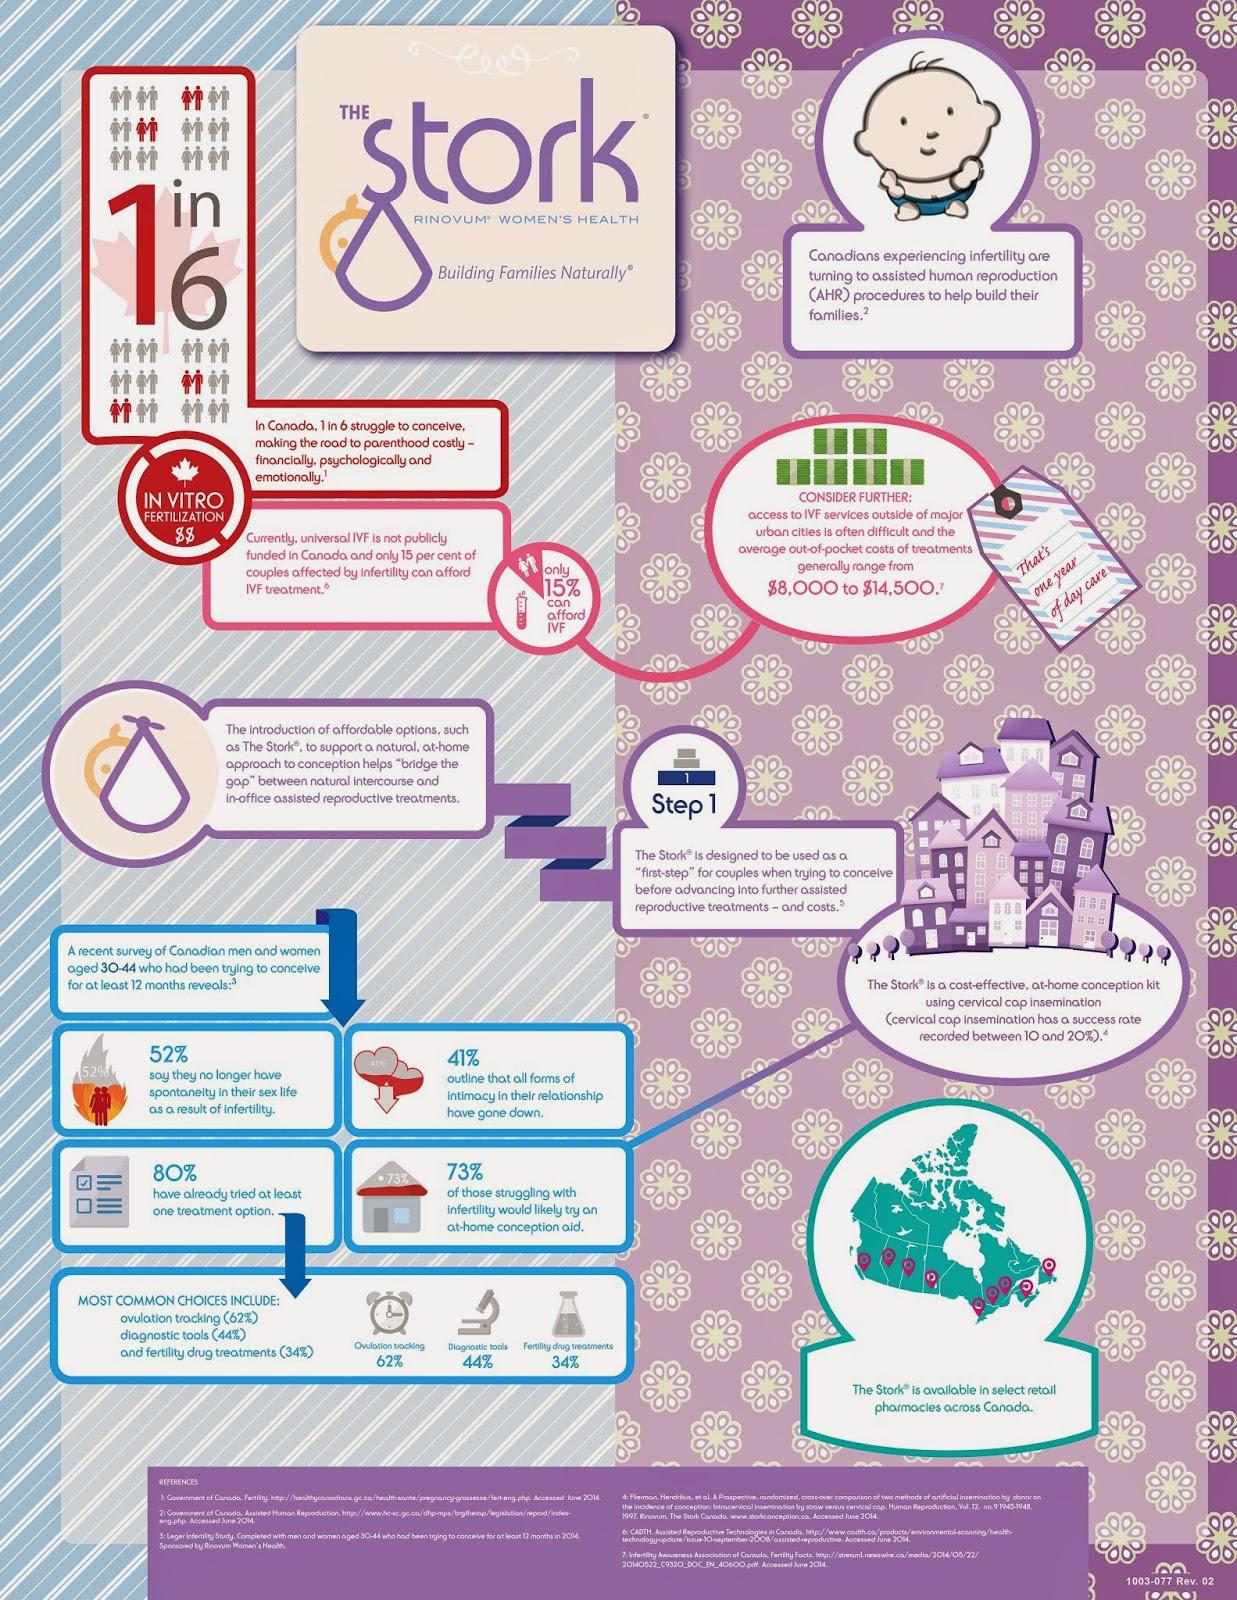 infographic, fertility, infertility, The Stork